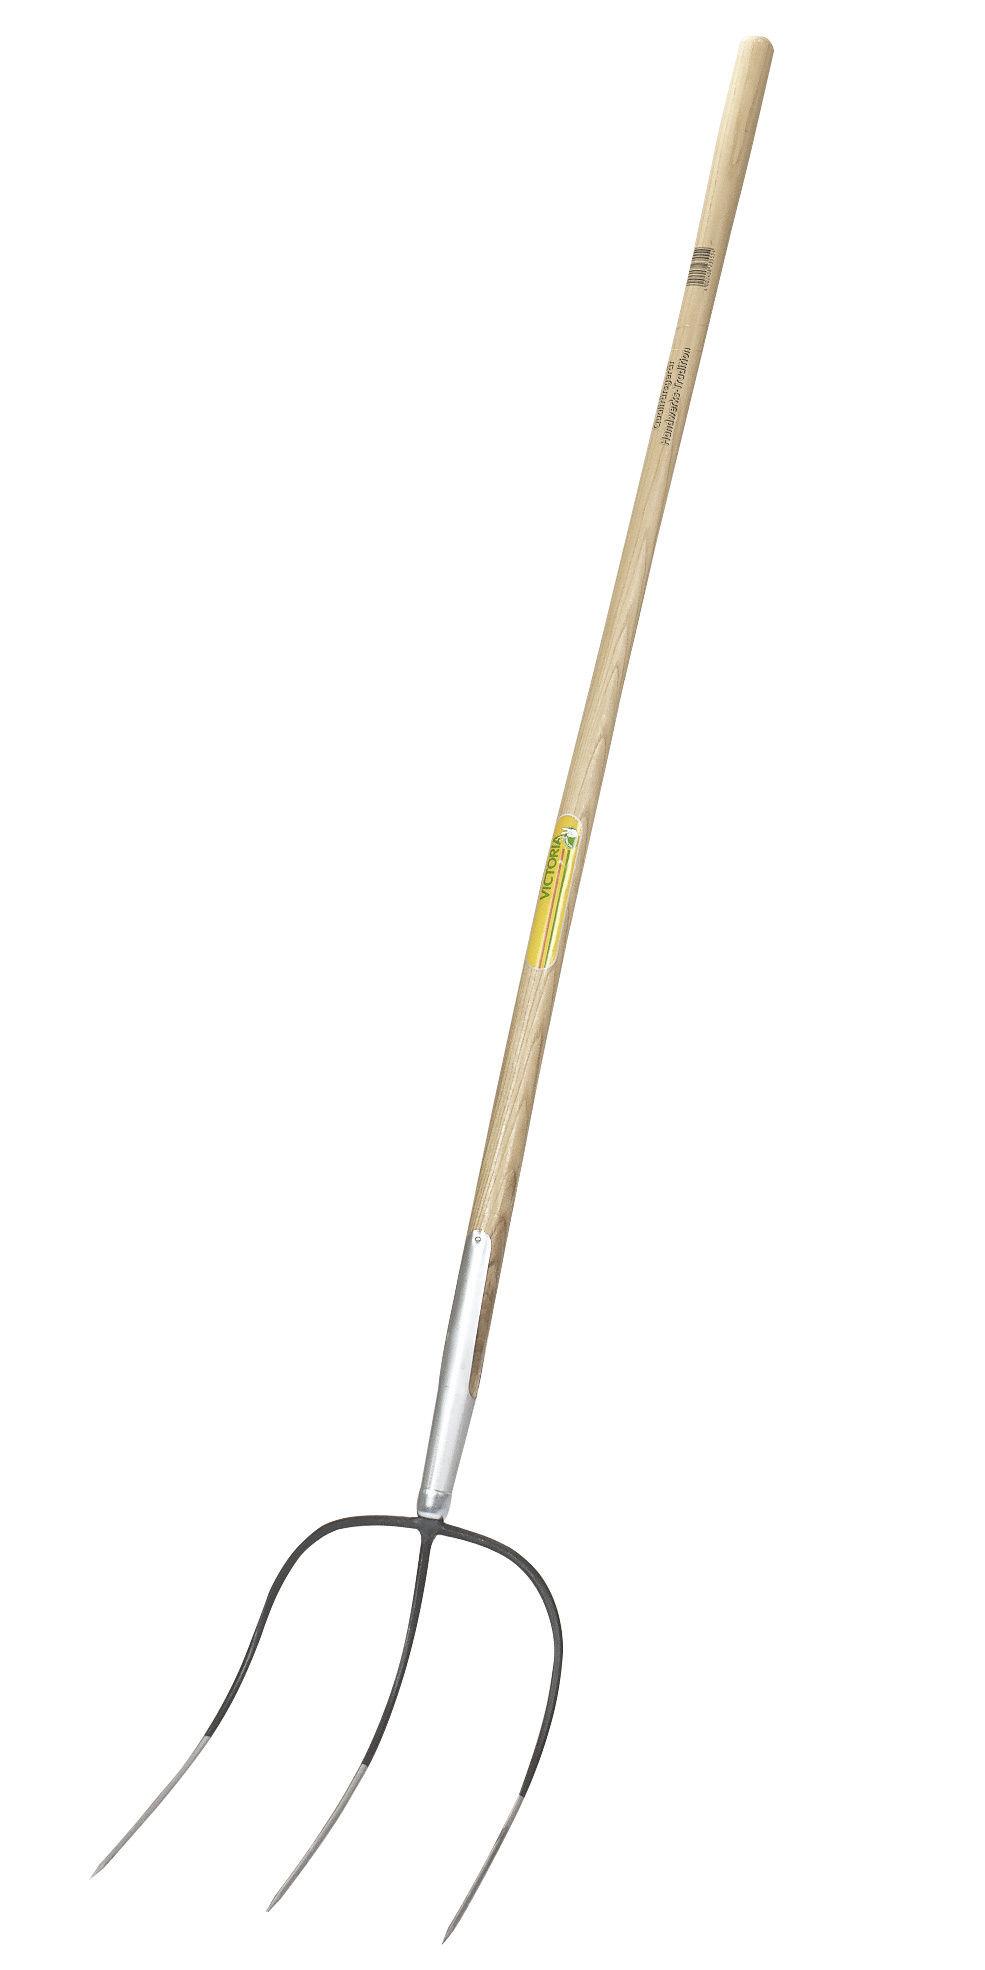 Heugabel 3955 mit 135cm-Esch.St., 3zk., 37x32cm